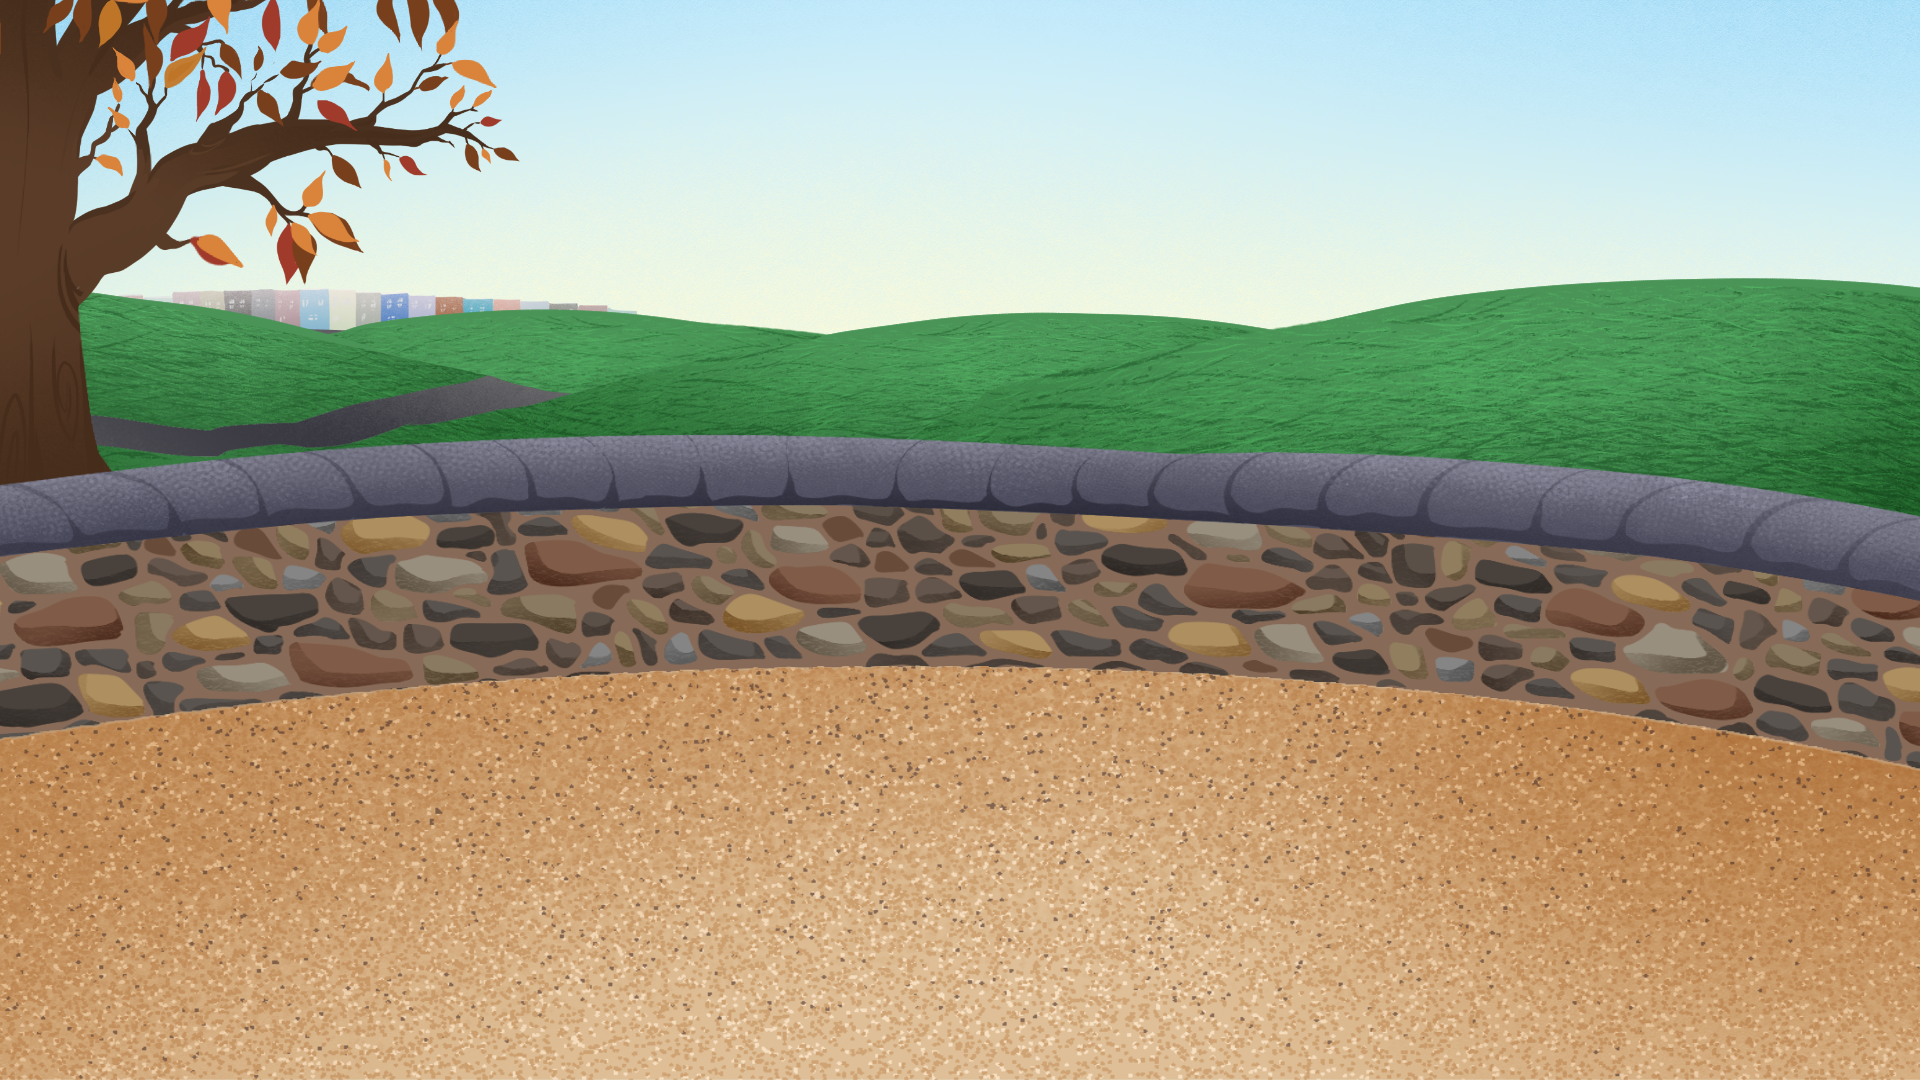 Playground Alternate Angle